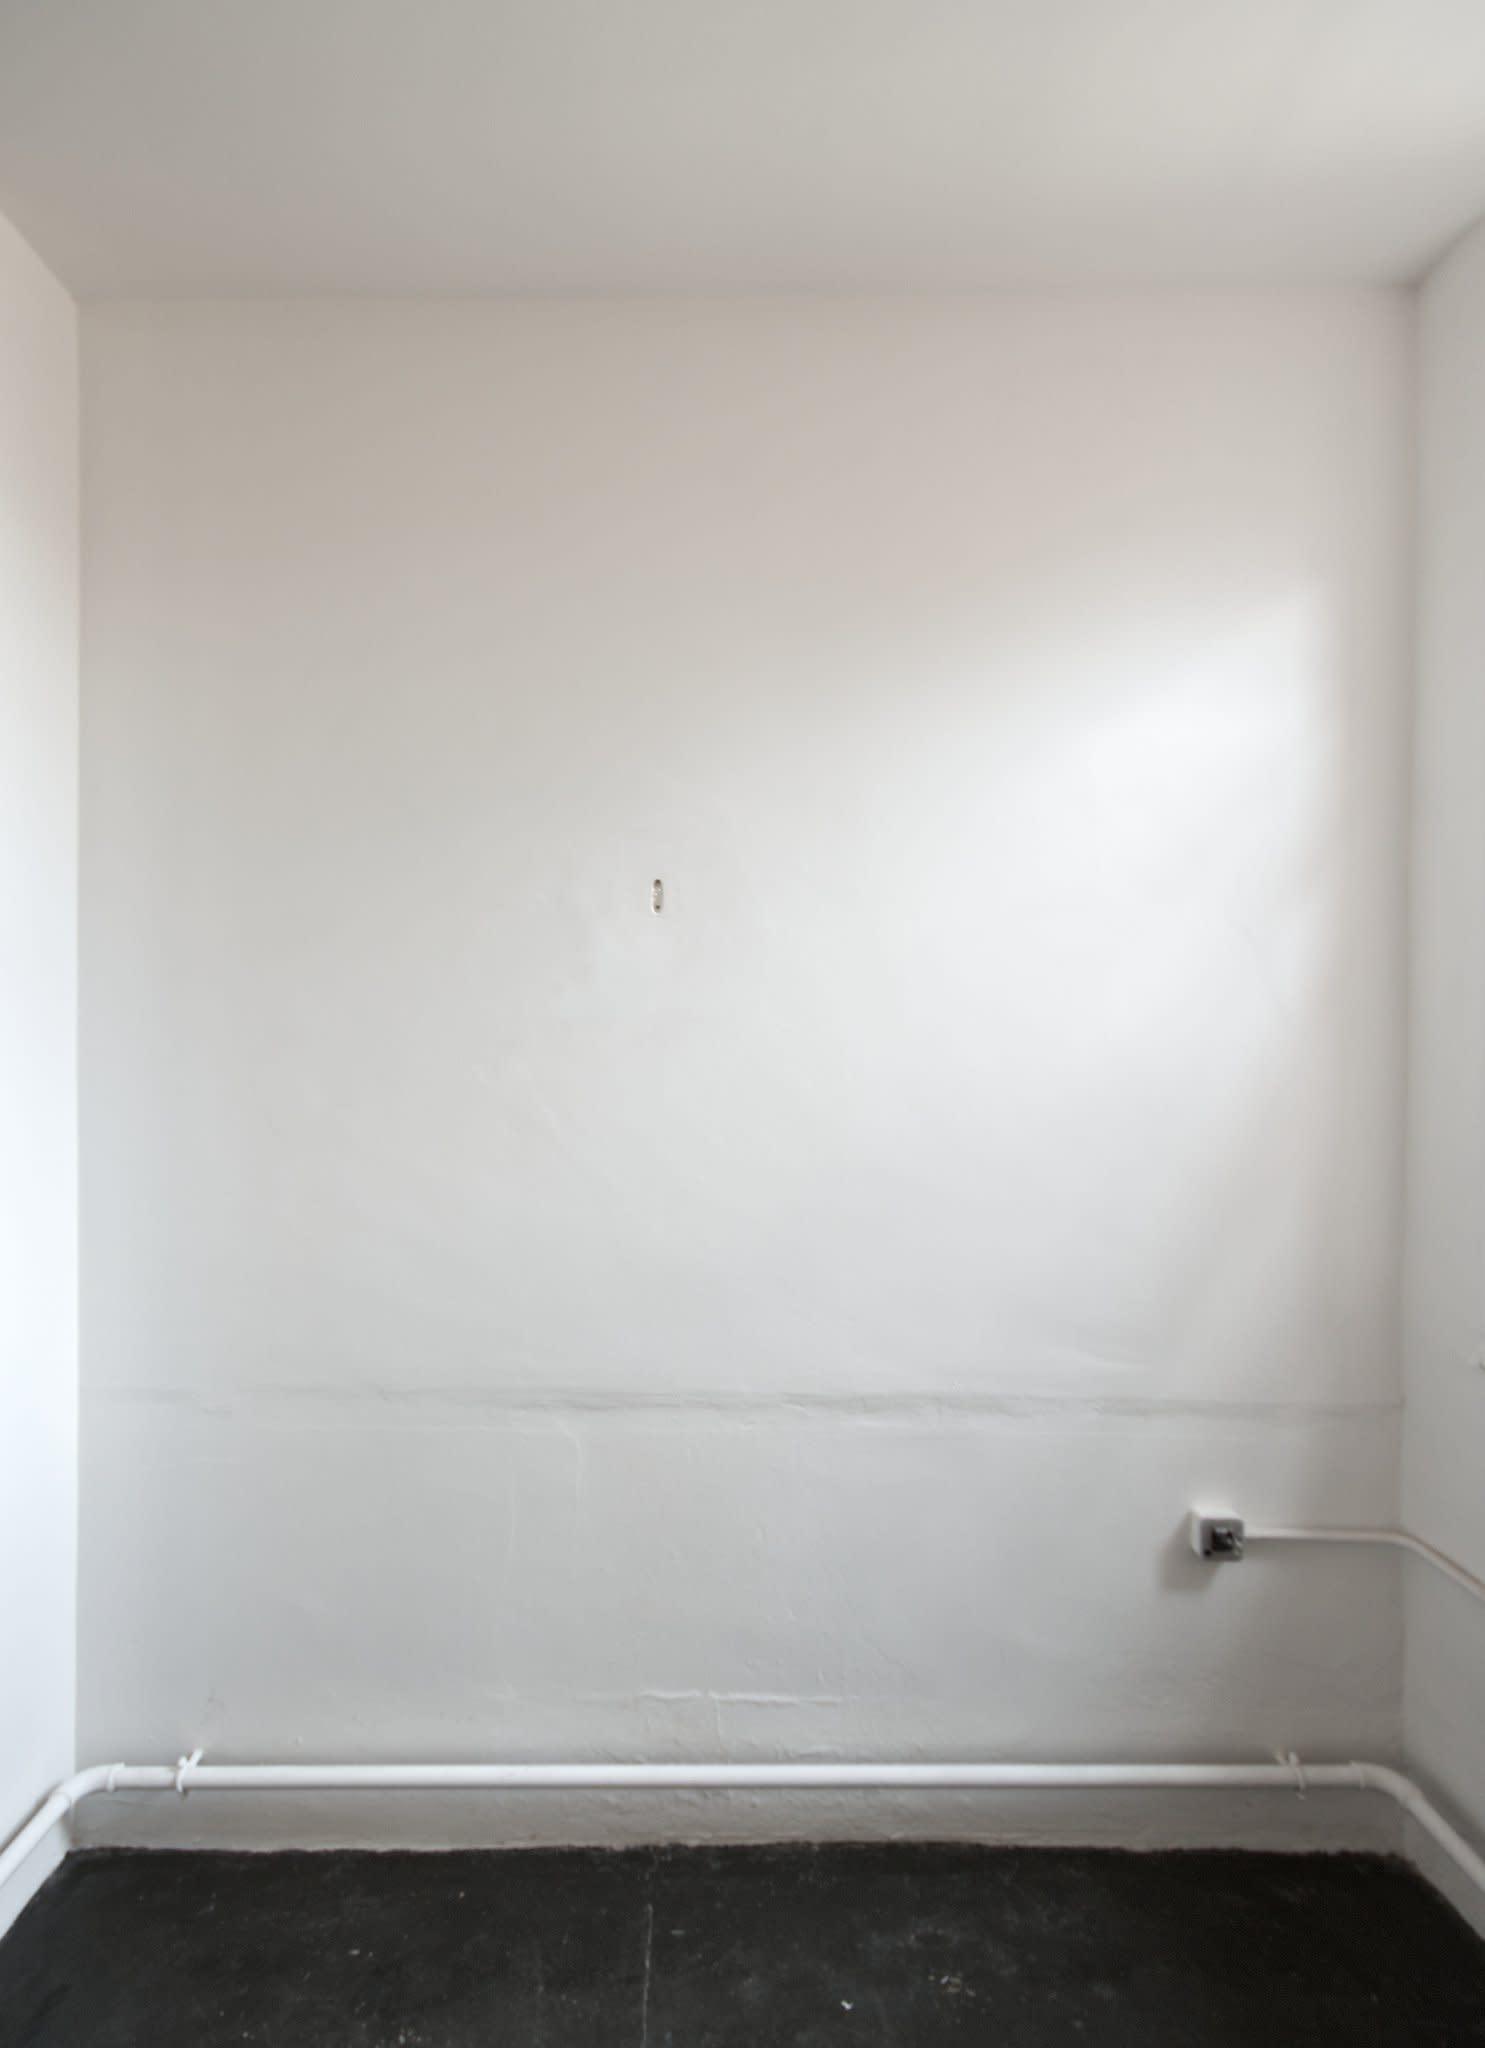 <span class=&#34;link fancybox-details-link&#34;><a href=&#34;/exhibitions/28/works/artworks5404/&#34;>View Detail Page</a></span><div class=&#34;artist&#34;><strong>Richard Rigg</strong></div><div class=&#34;title&#34;><em>Wall Hanging</em>, 2010</div><div class=&#34;medium&#34;>Plaster</div><div class=&#34;dimensions&#34;>22 x 14 cm<br>8 5/8 x 5 1/2 in</div>